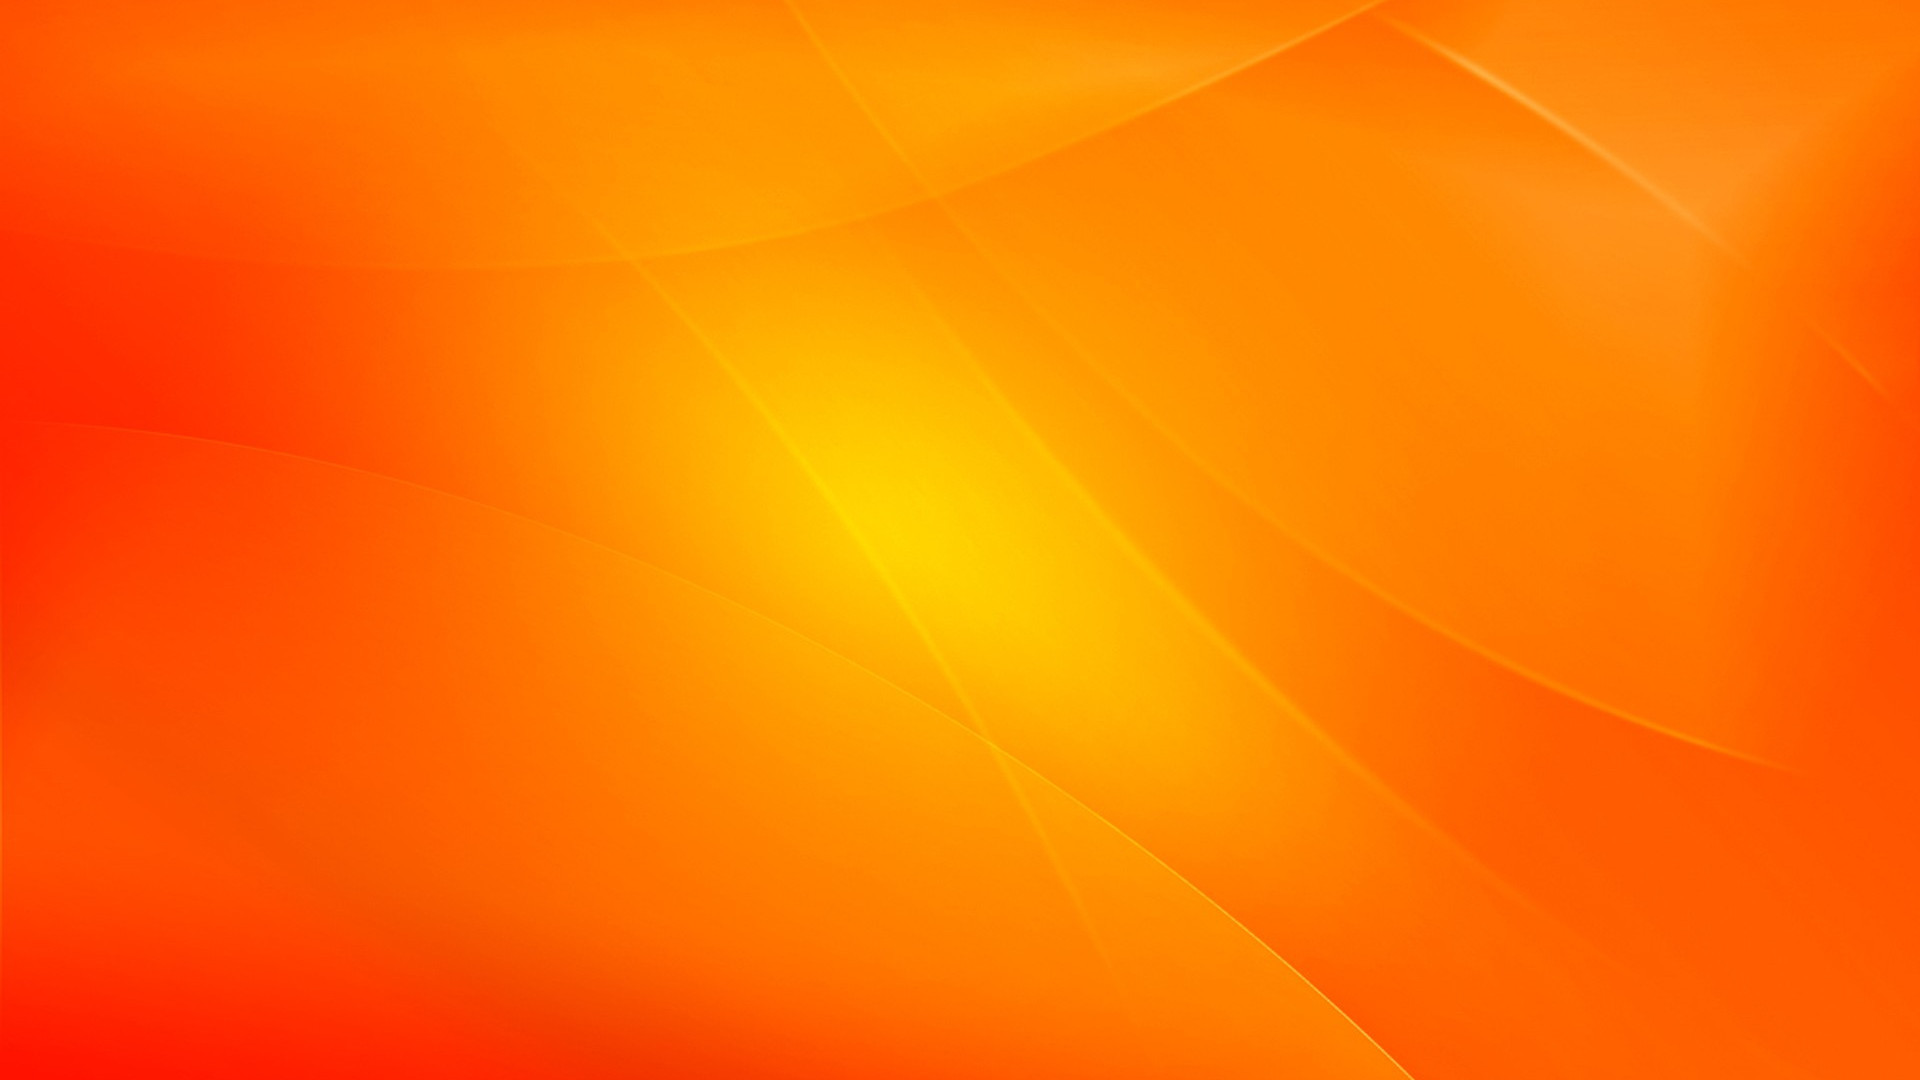 Abstract Orange Wallpaper